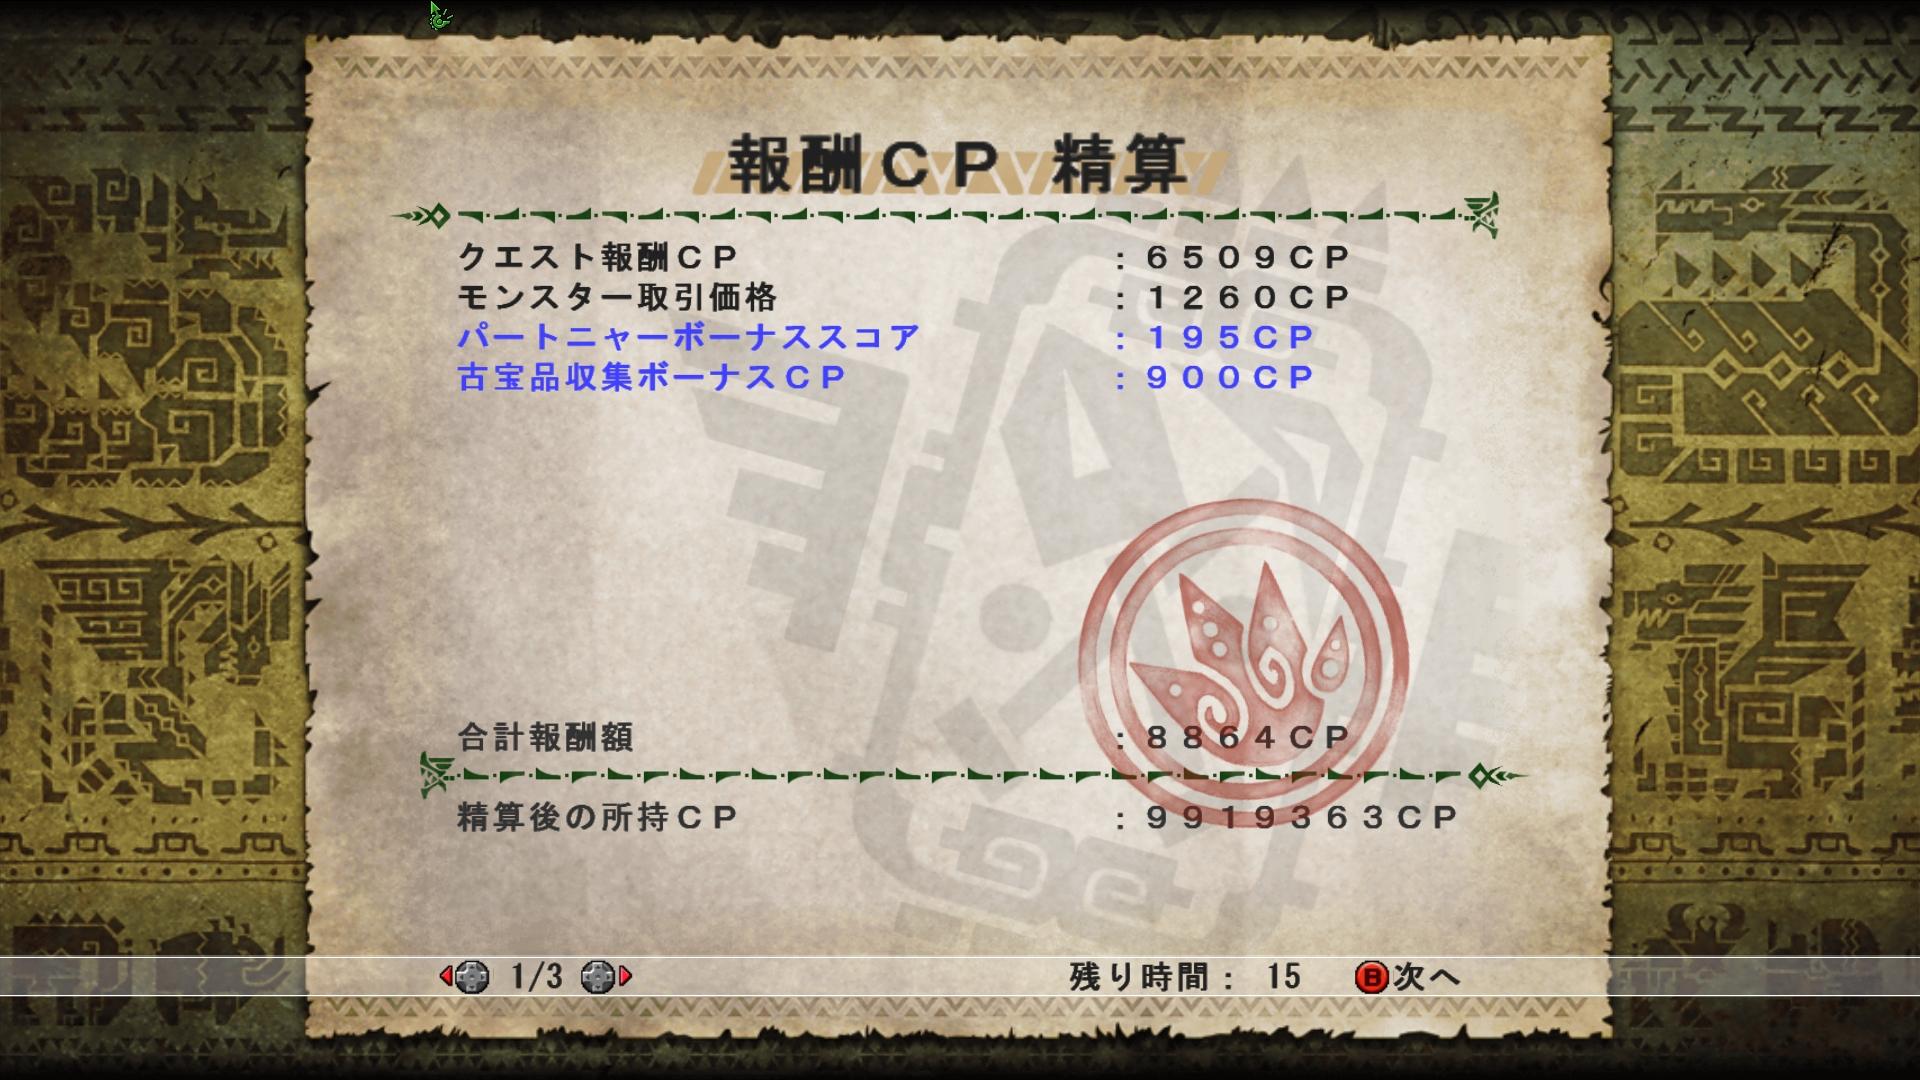 mhf_20150507_172240_327.jpg